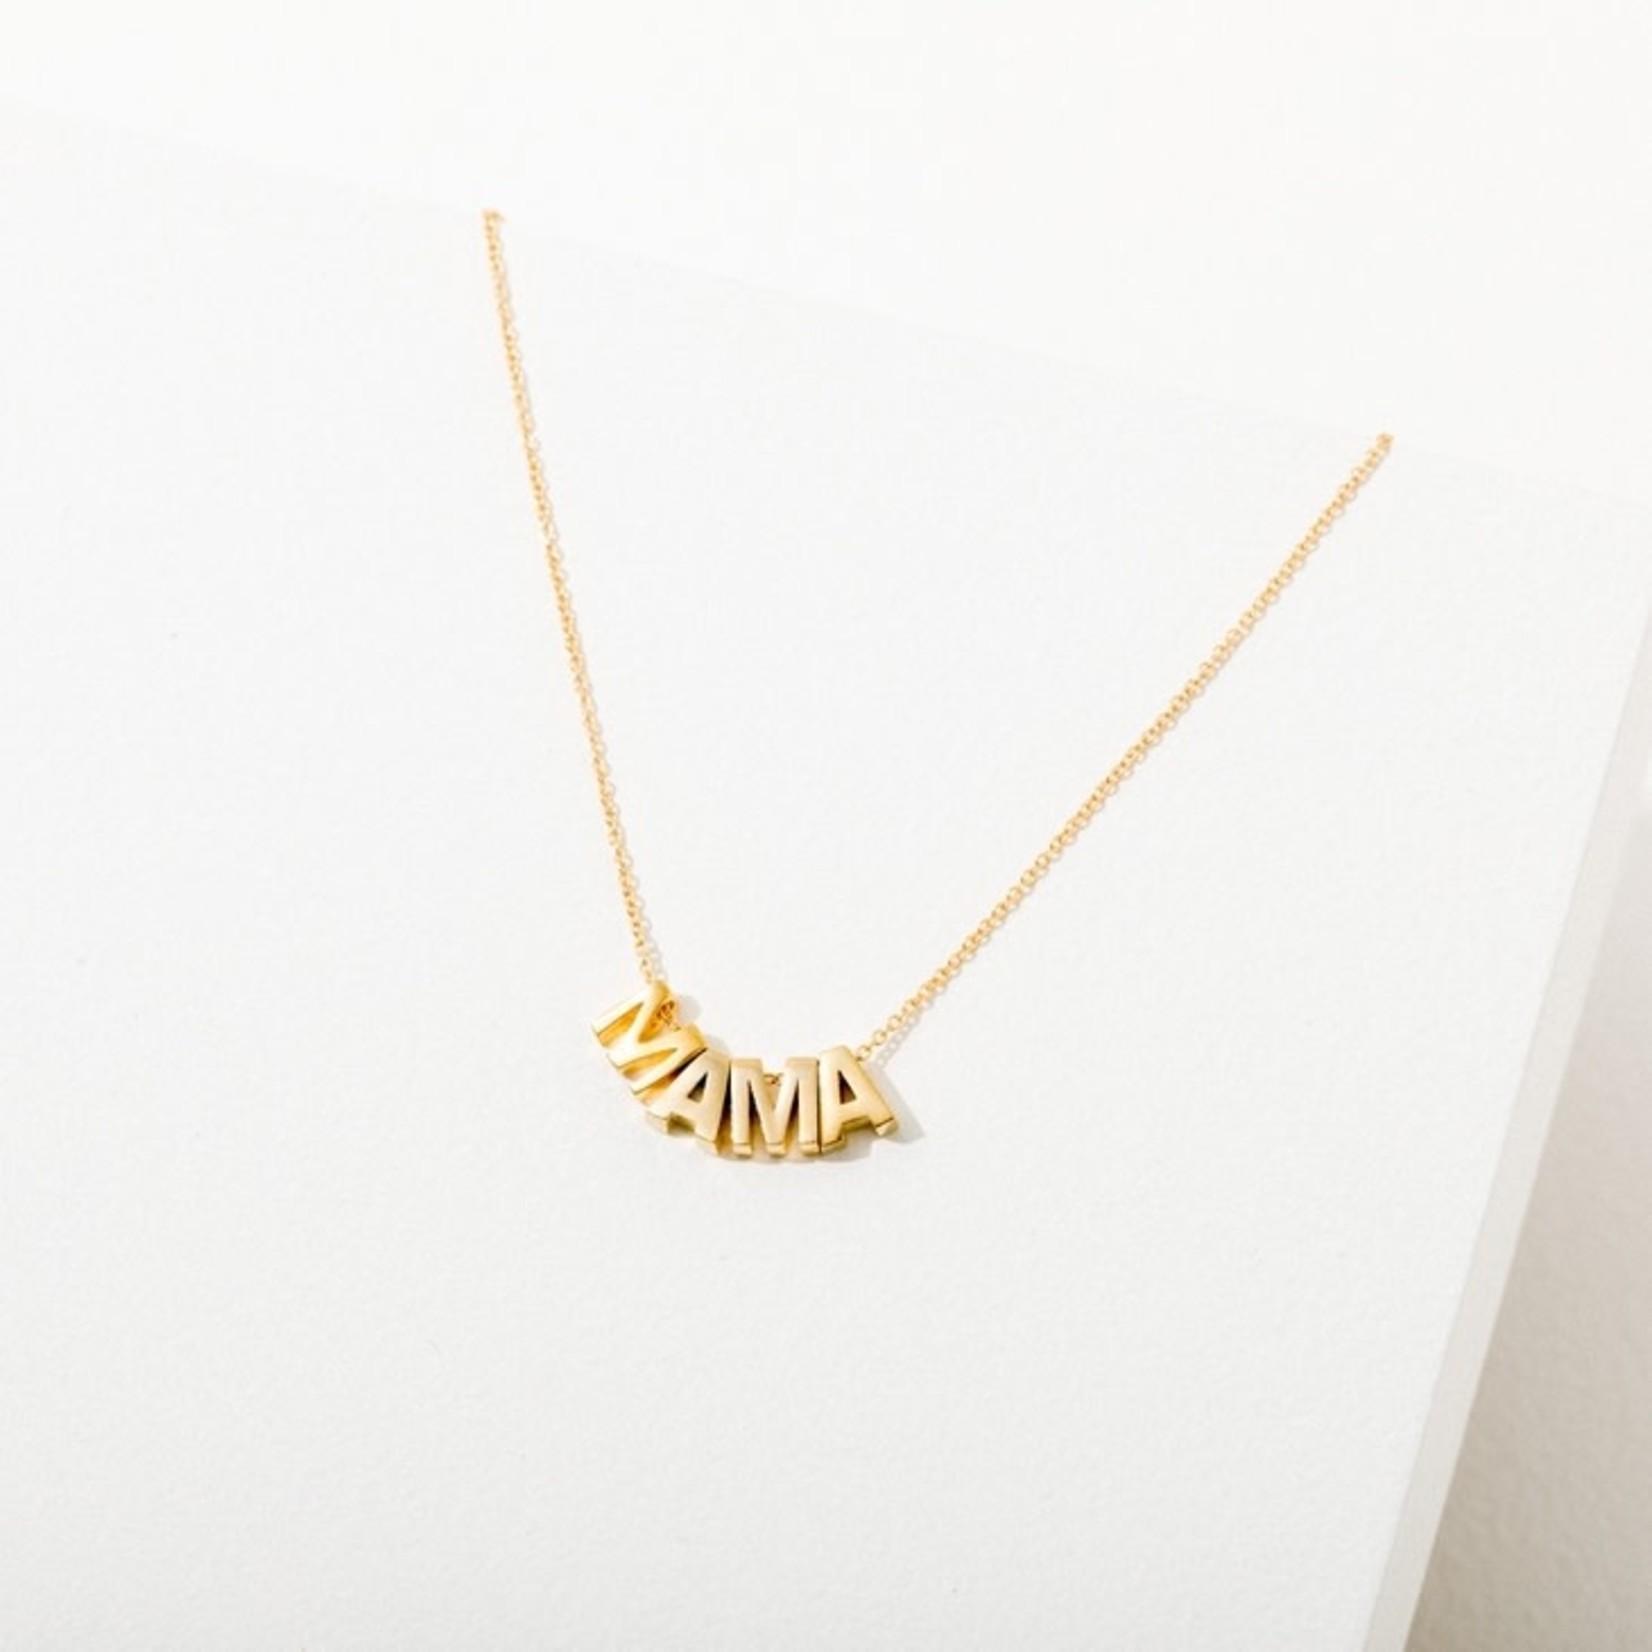 Larissa Loden Jewelry Larissa Loden MAMA Necklace 24K Gold Plate